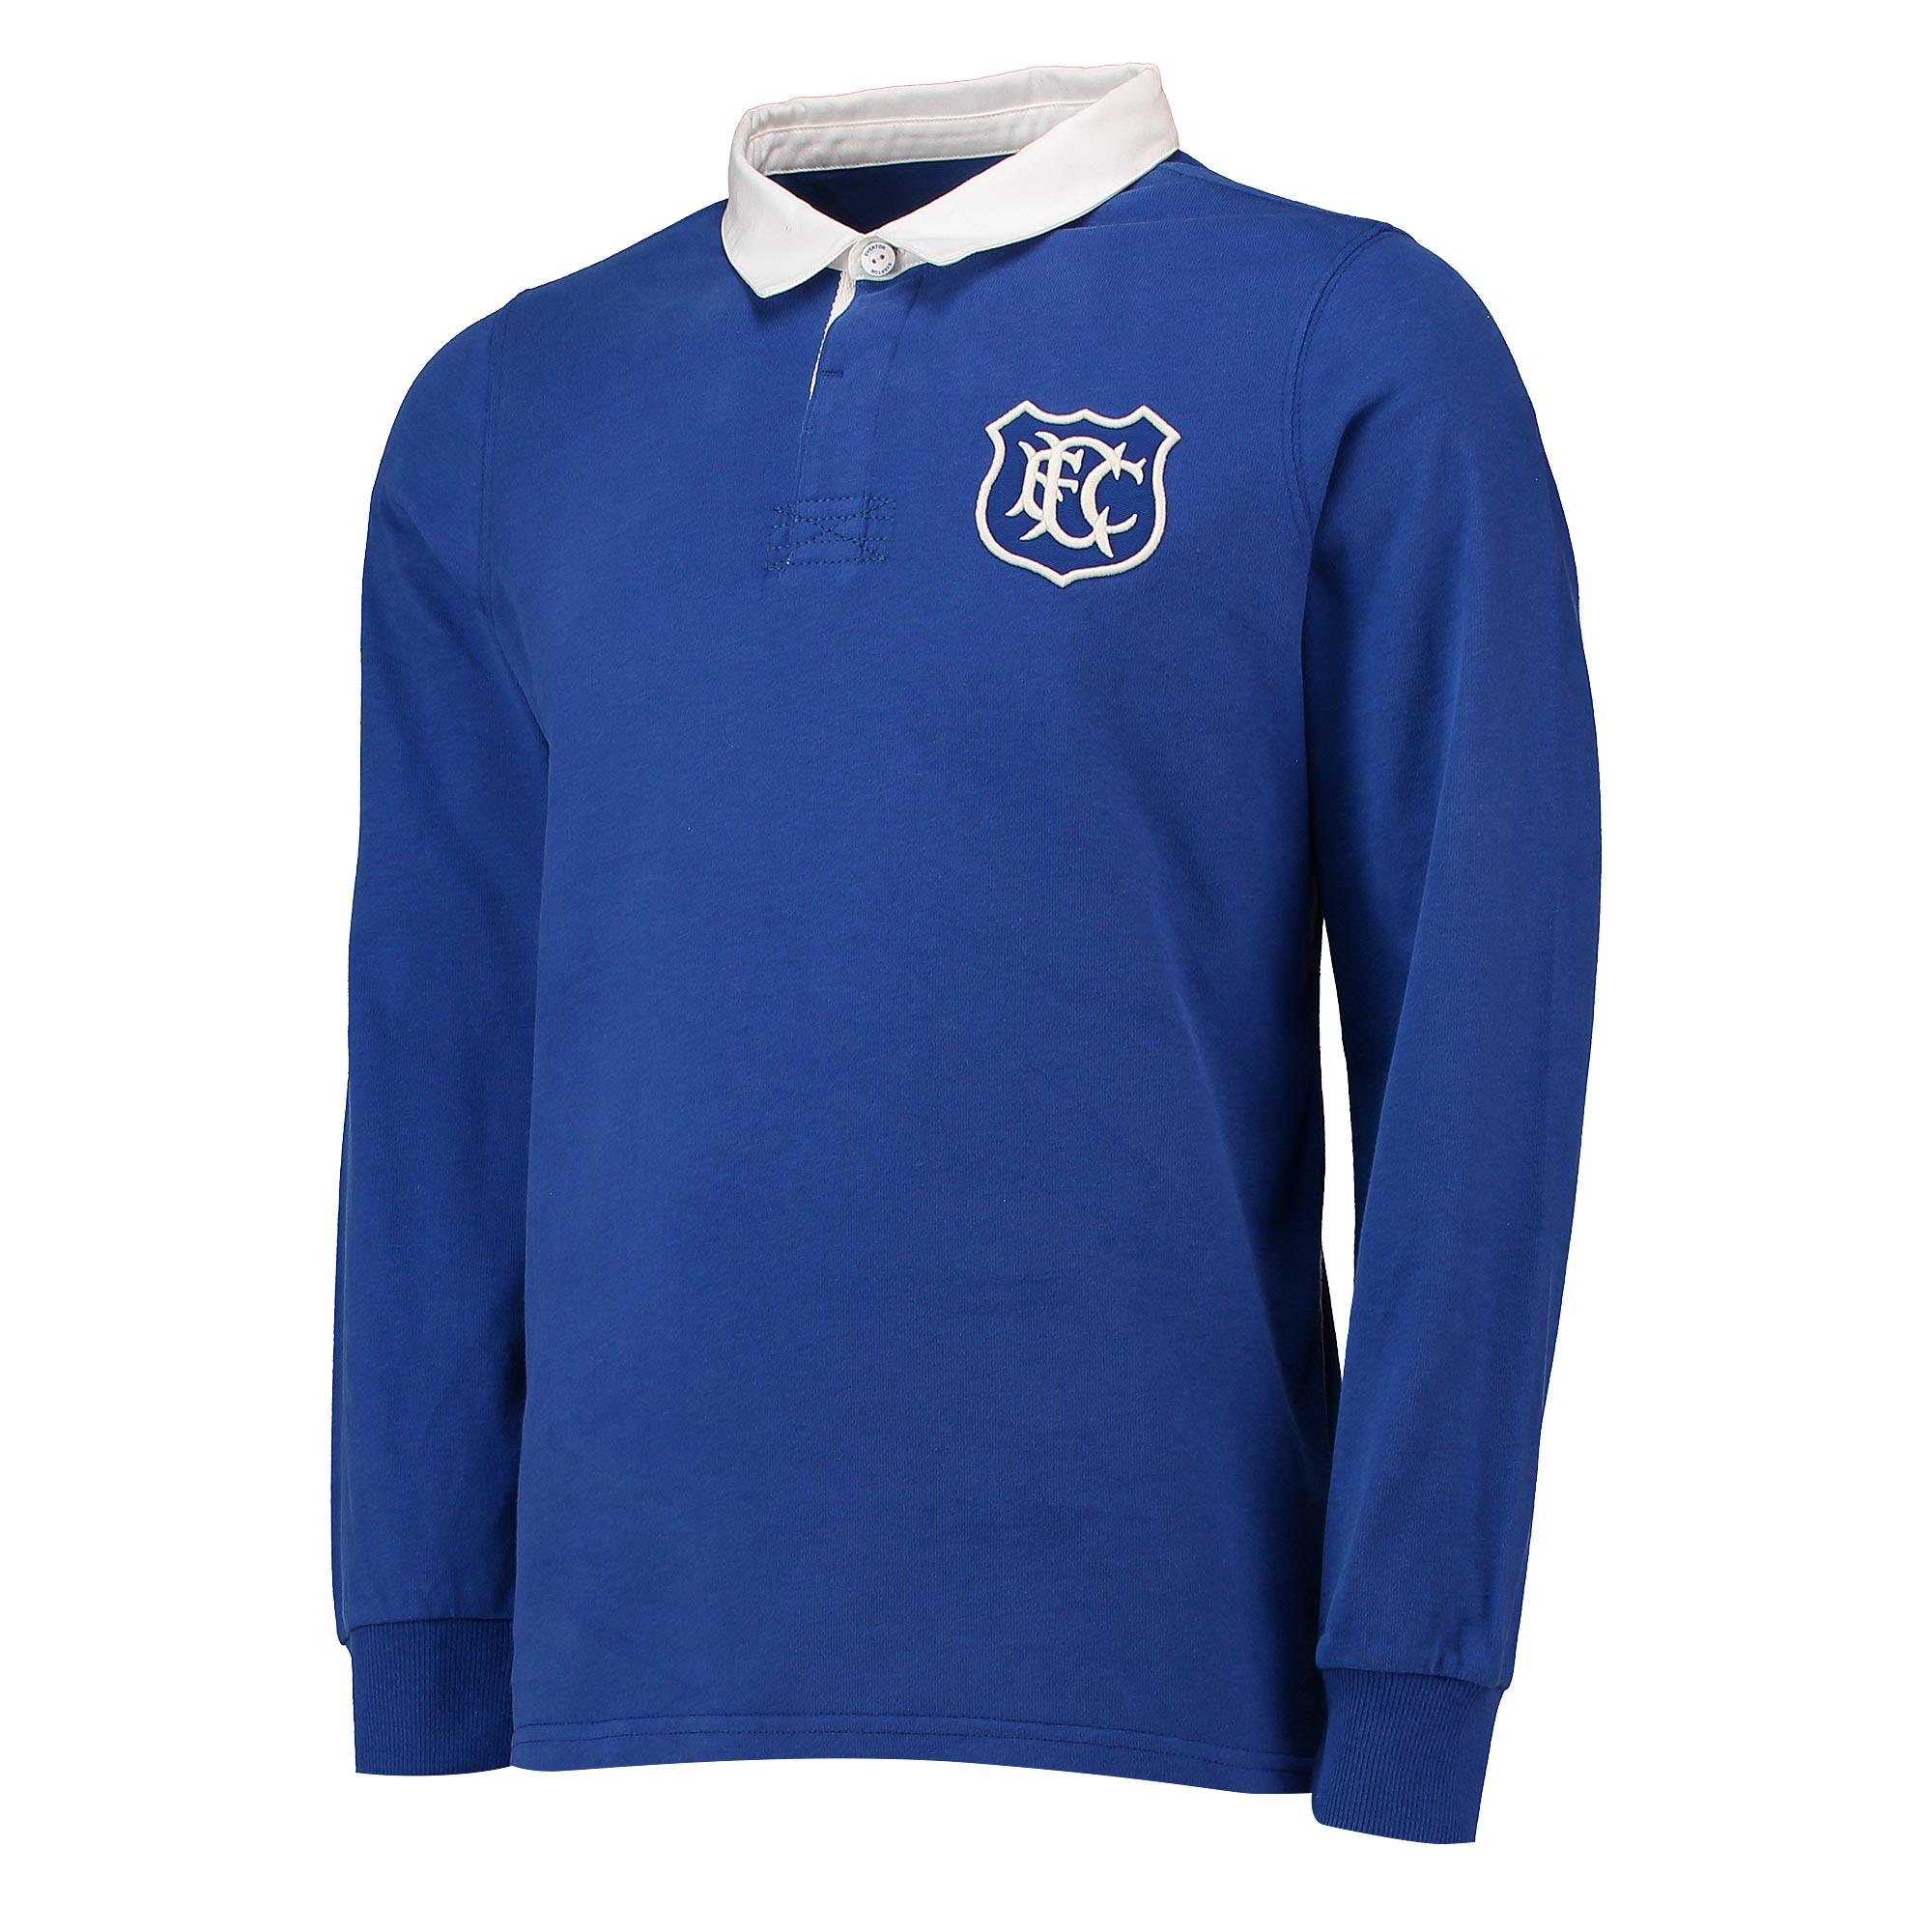 Everton Goodison 1920 Ruby Shirt - Royal - Men